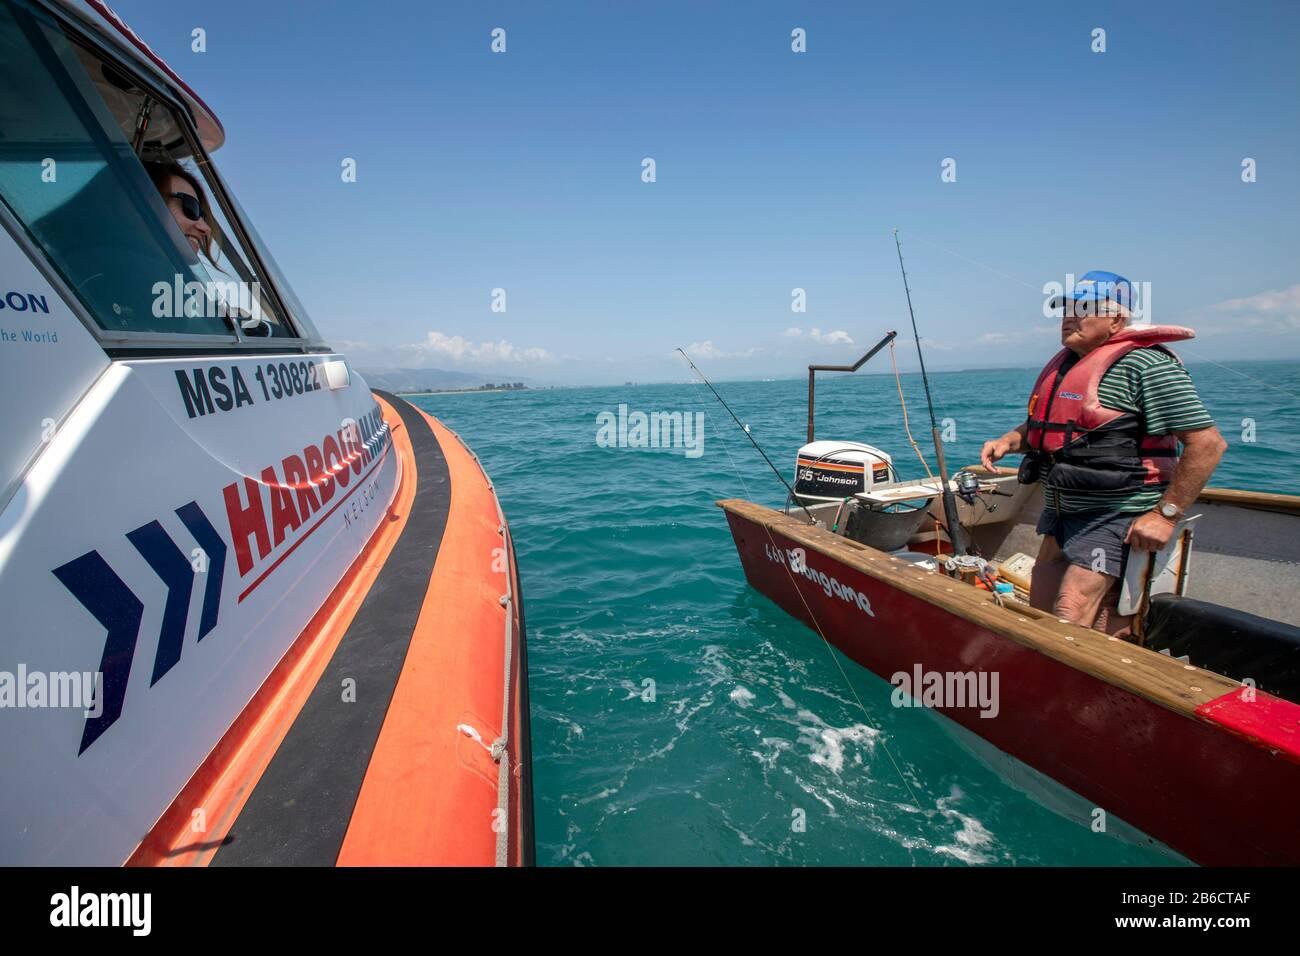 Port Nelson deputy harbourmaster Amanda Kerr on the waters off Port Nelson, Nelson, New Zealand Stock Photo